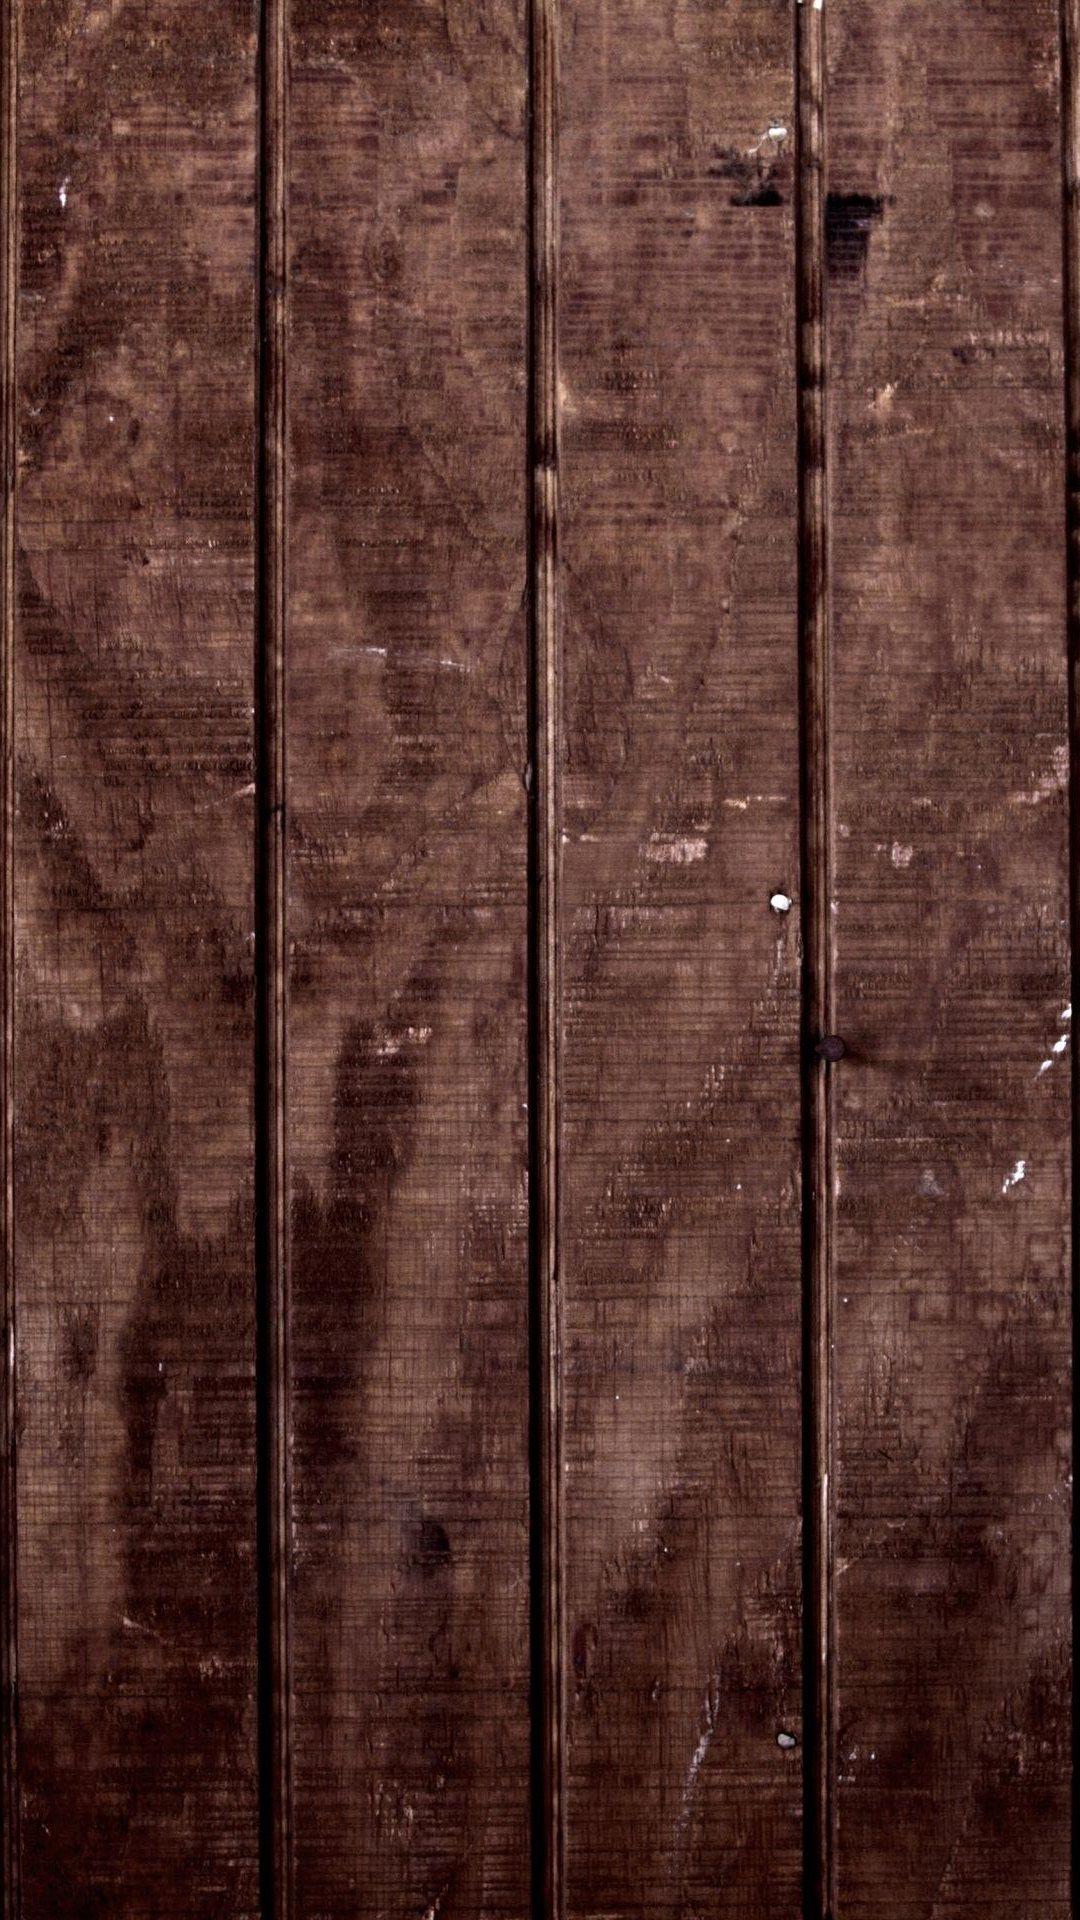 Wood Floor Texture iPhone 6 Plus HD Wallpaper iPod Wallpaper HD 1080x1920